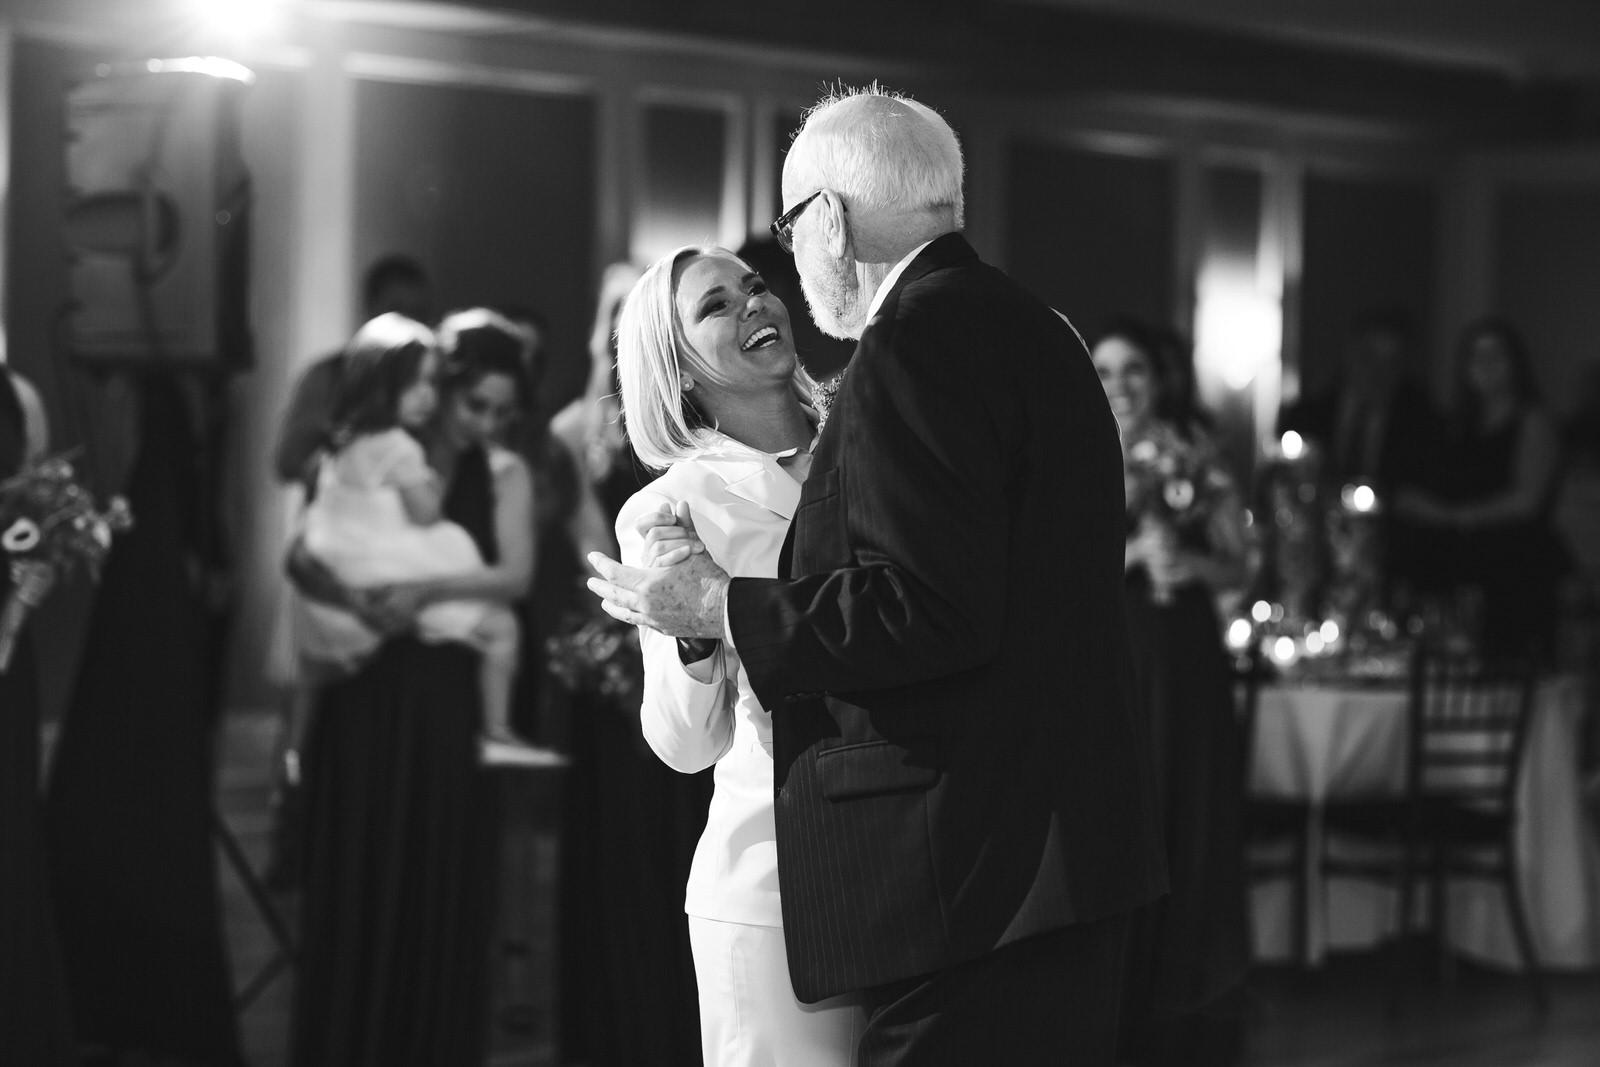 father_daughter_dance_lgbtq_weddings_tiny_house_photo.jpg